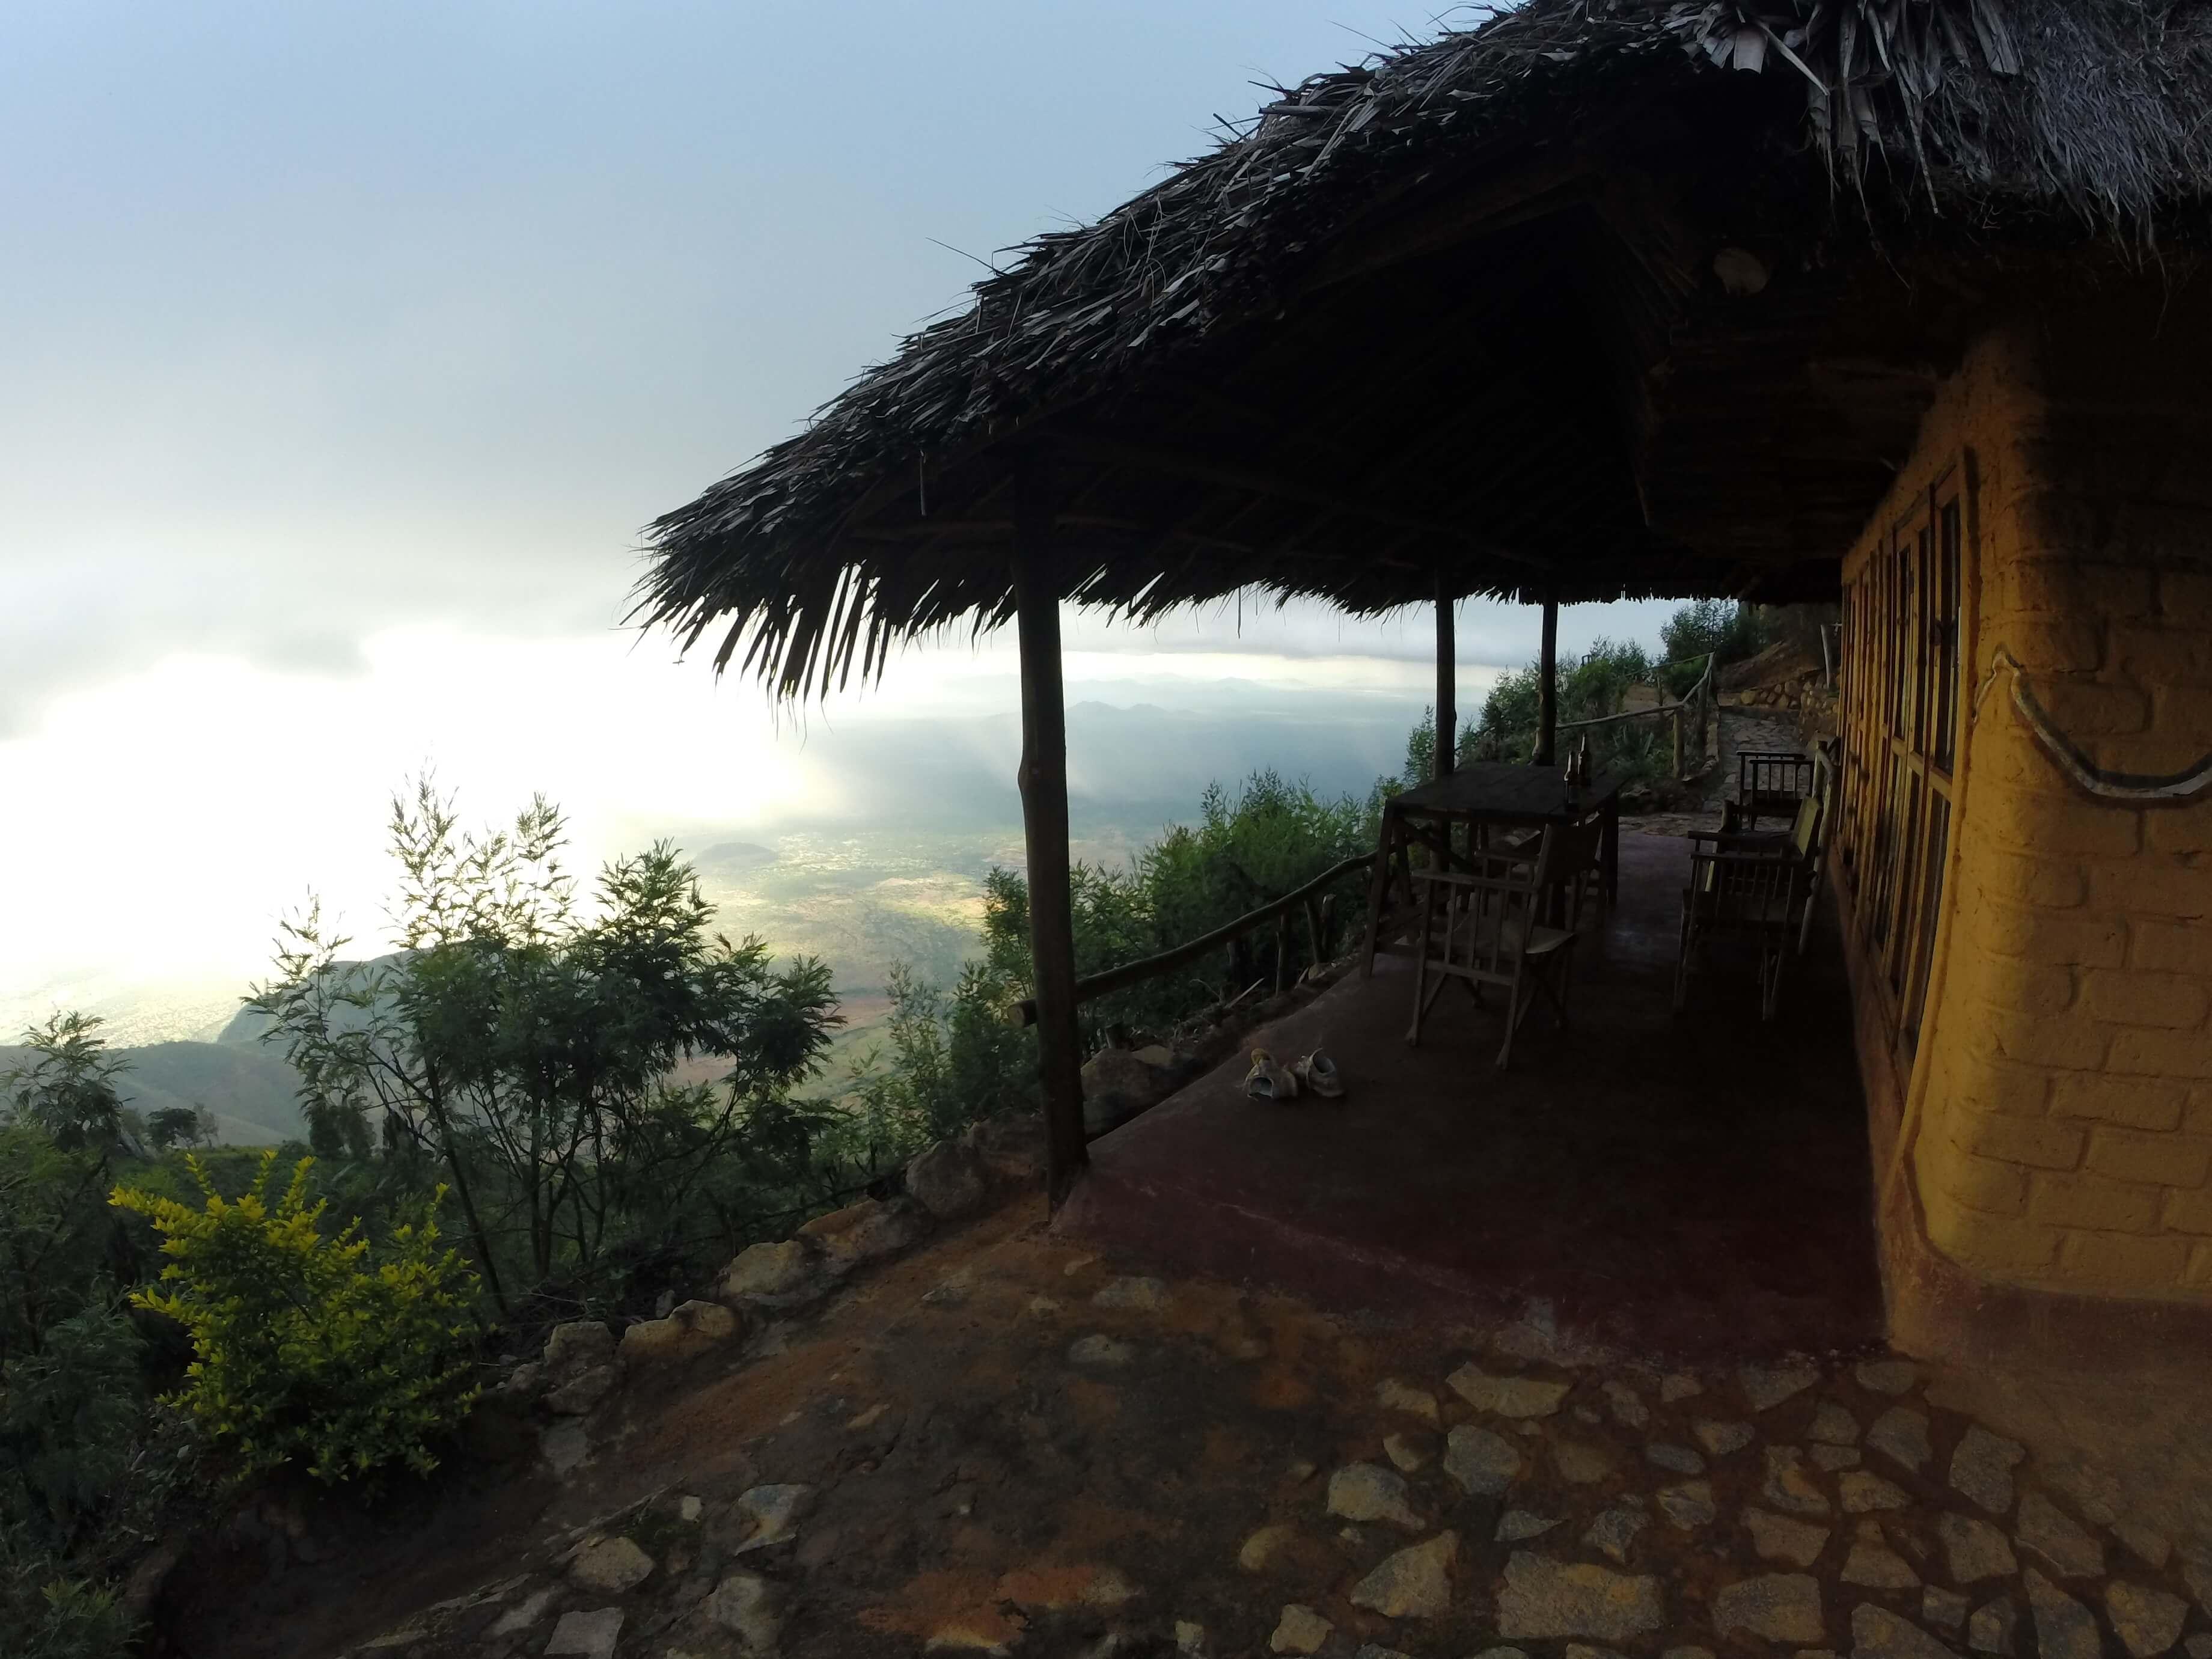 Mambo Cliff Inn